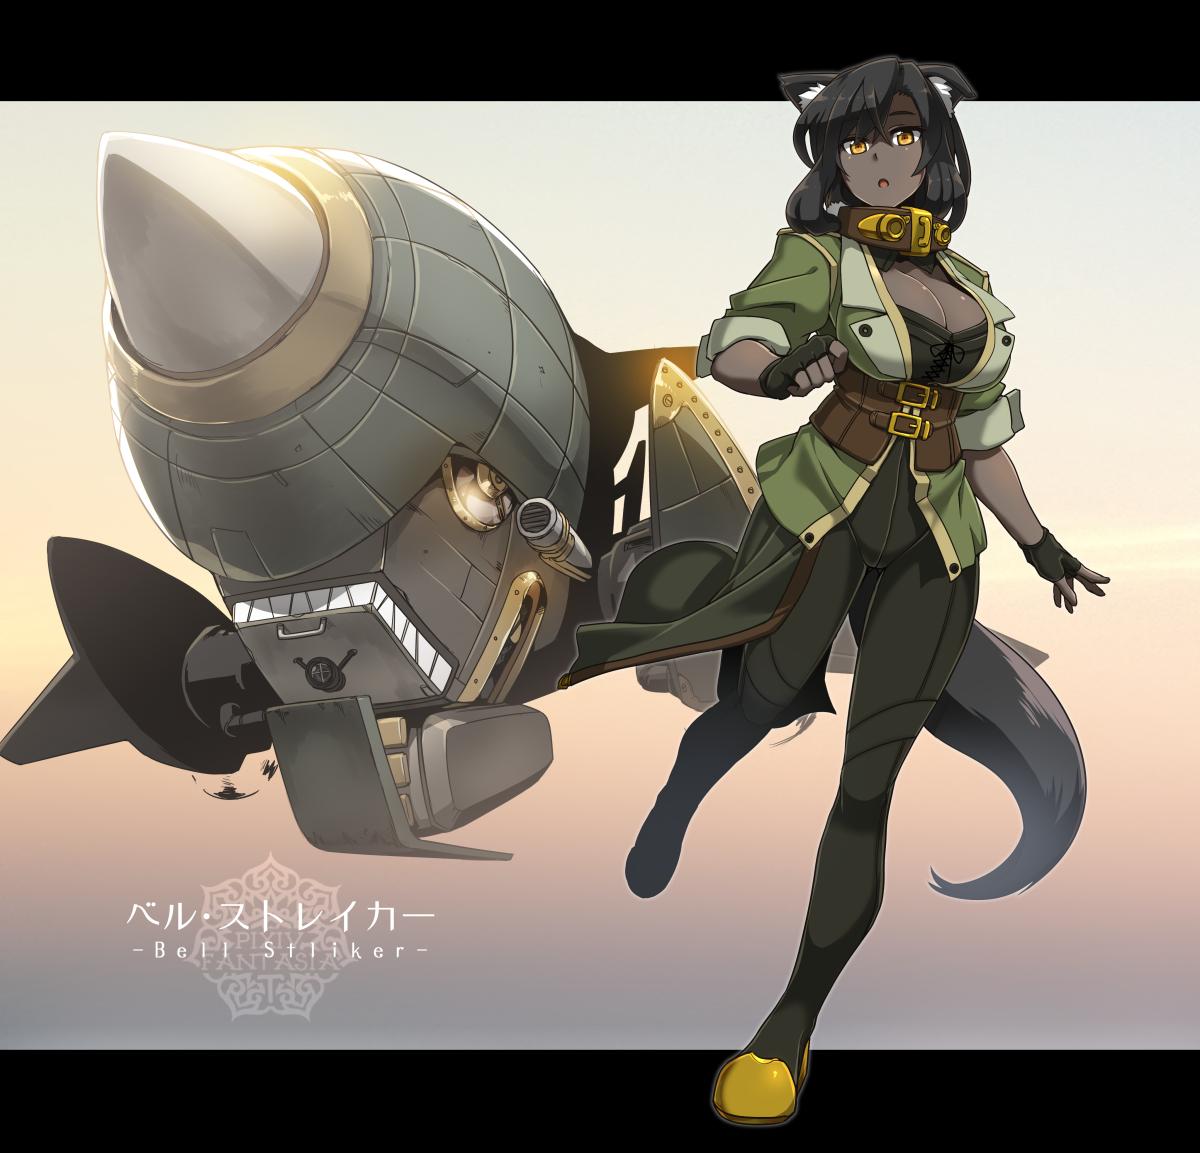 Characters: Beast-Kin (animal-trait people) 5558a50ba4eb03b87dd39aea5e0b689d_by_makothesquirrel-dbvld8r